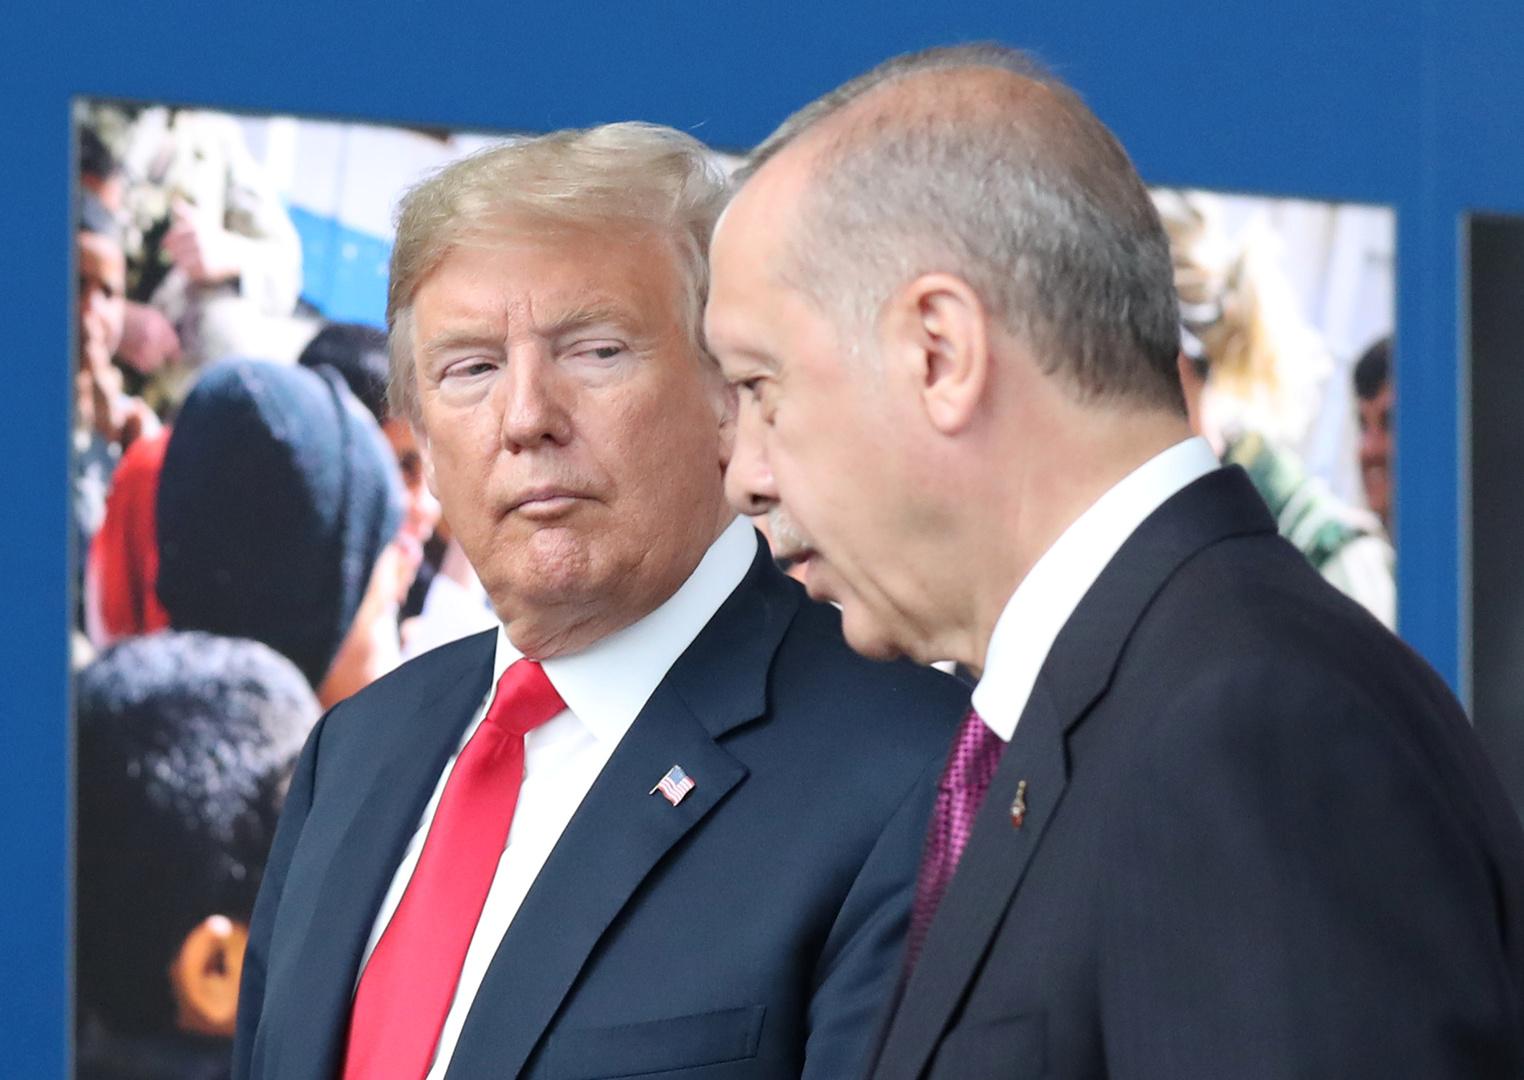 أردوغان: سنذكّر ترامب بعدم وفاء واشنطن بوعدها في سوريا